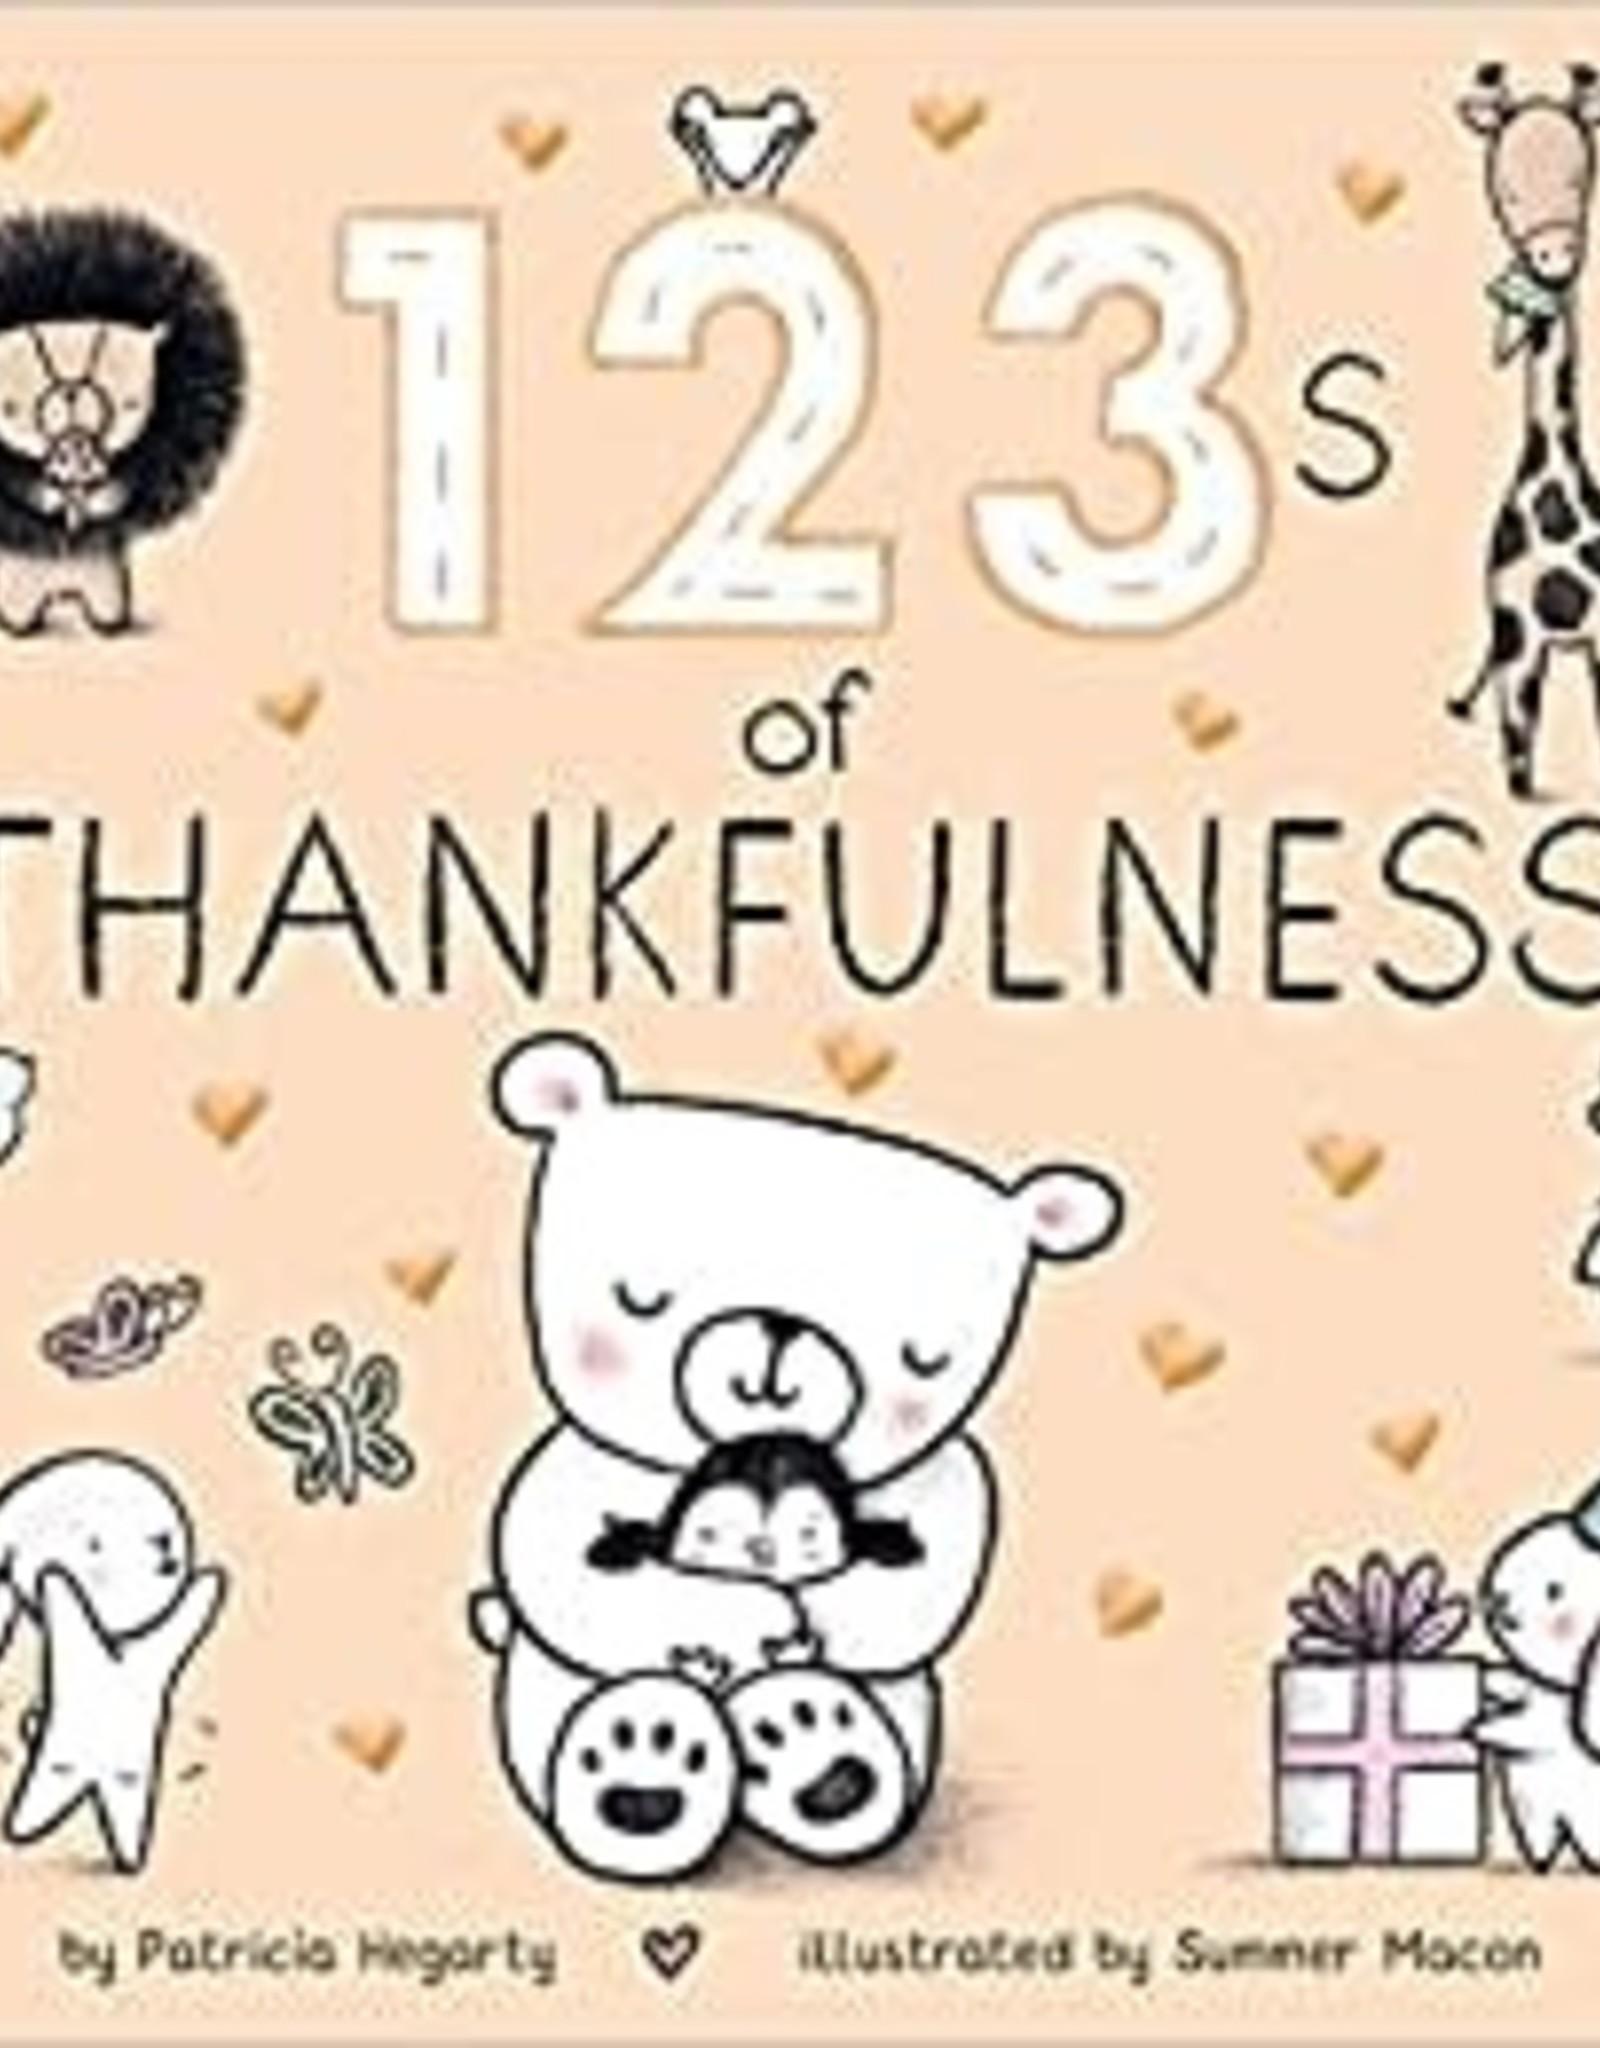 Penguin Random House 123s of Thankfulness